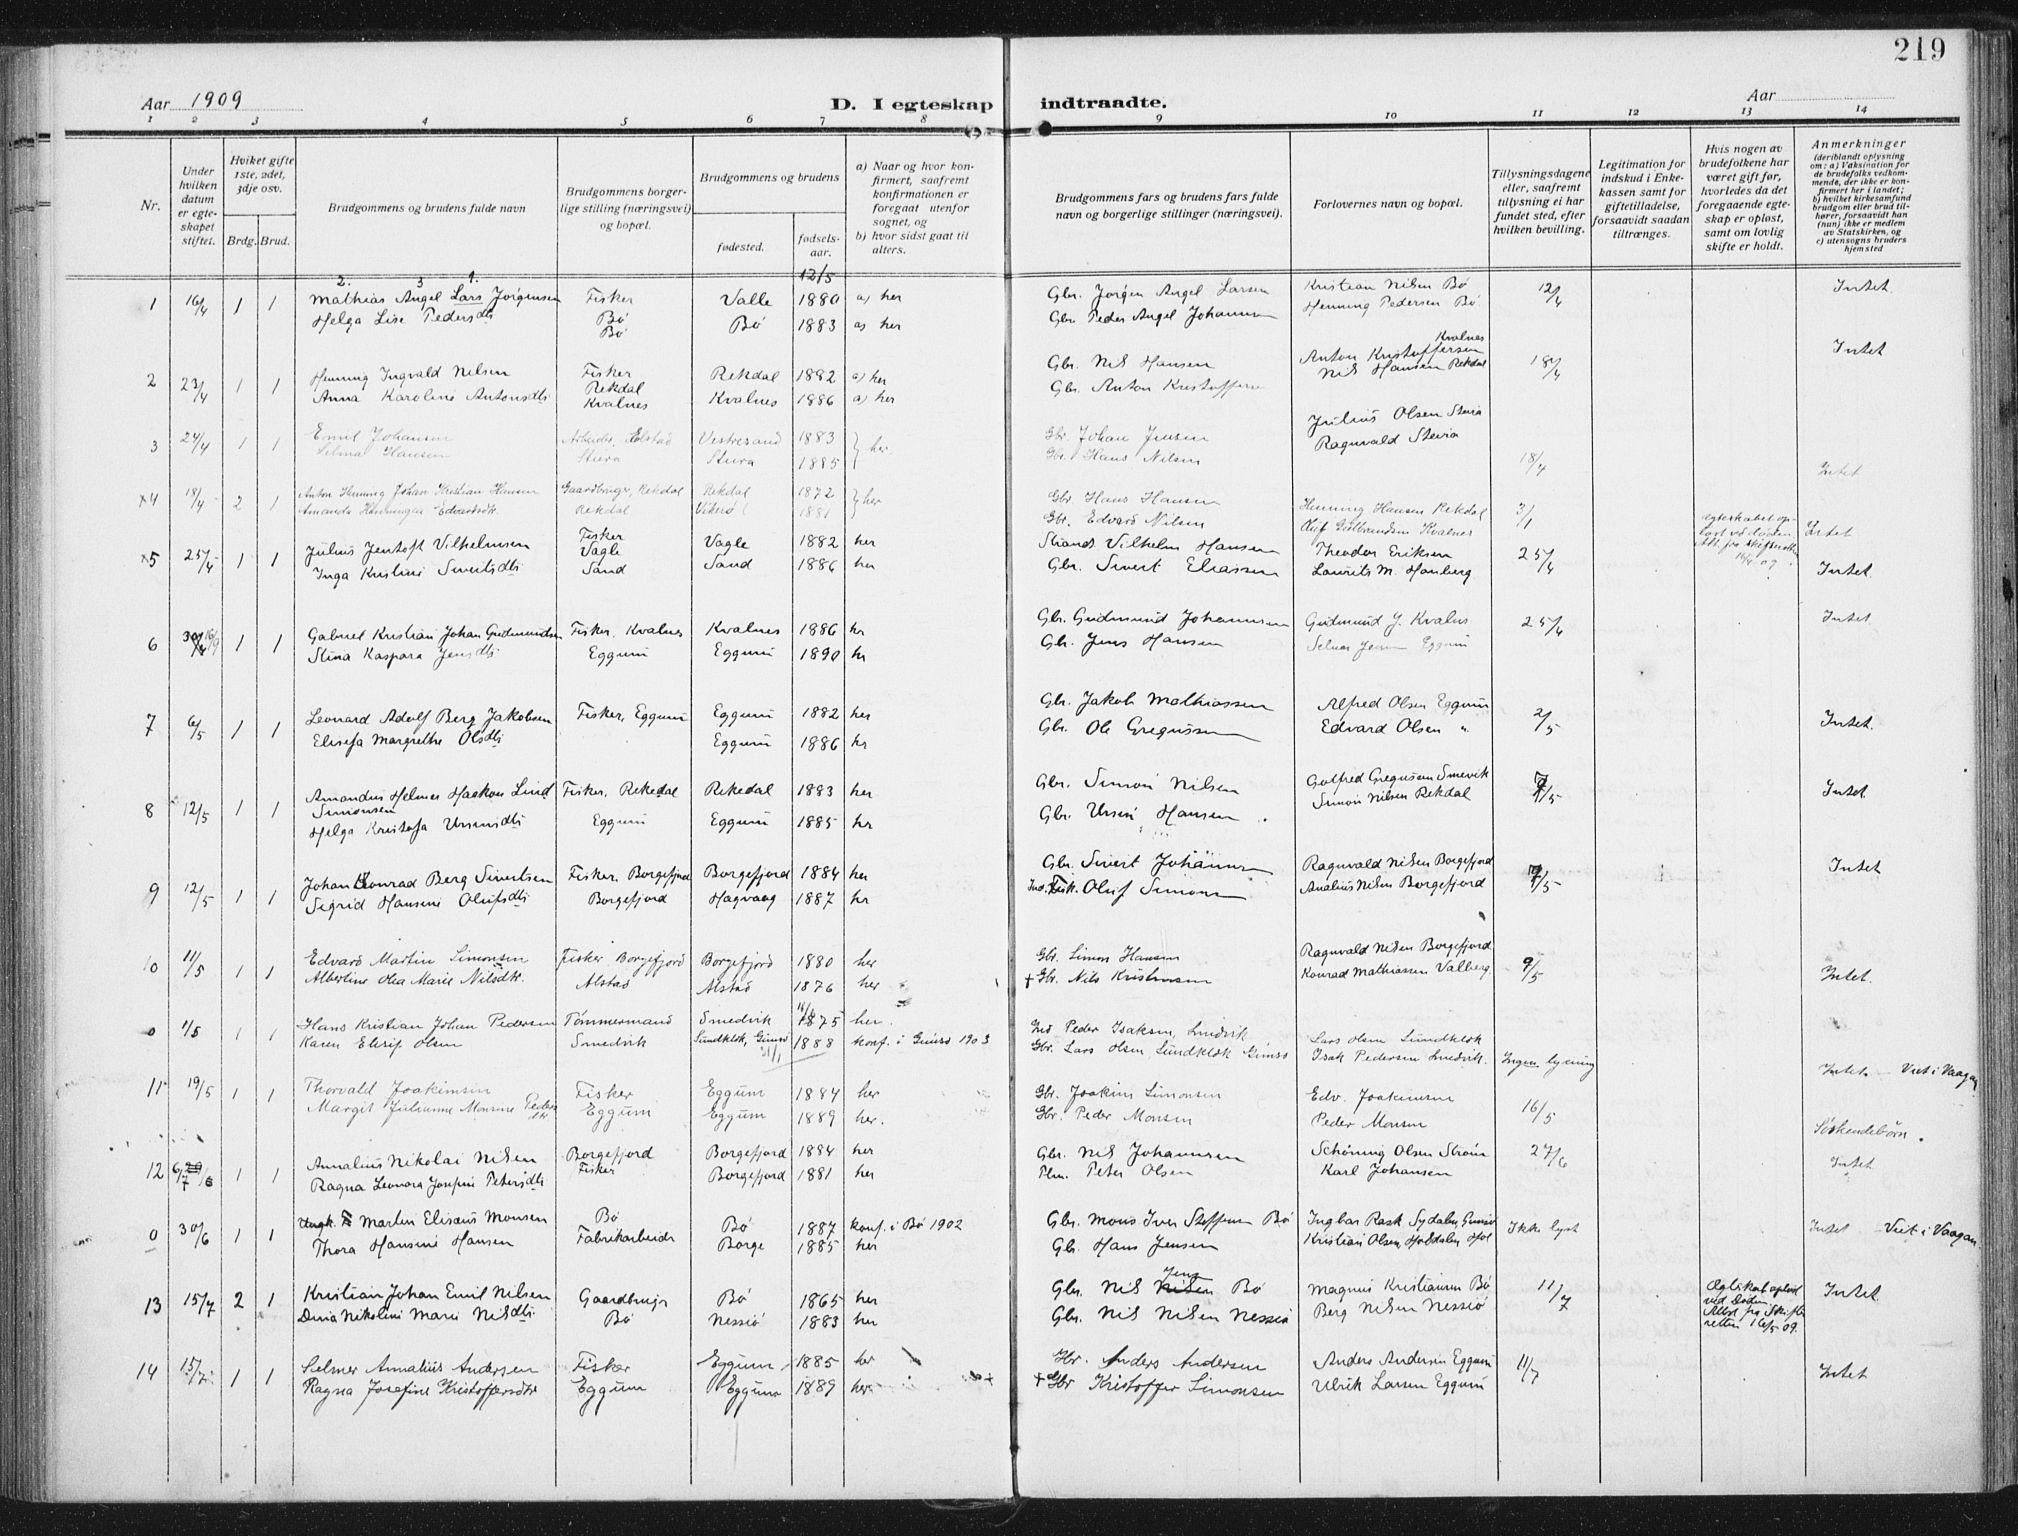 SAT, Ministerialprotokoller, klokkerbøker og fødselsregistre - Nordland, 880/L1135: Ministerialbok nr. 880A09, 1908-1919, s. 219